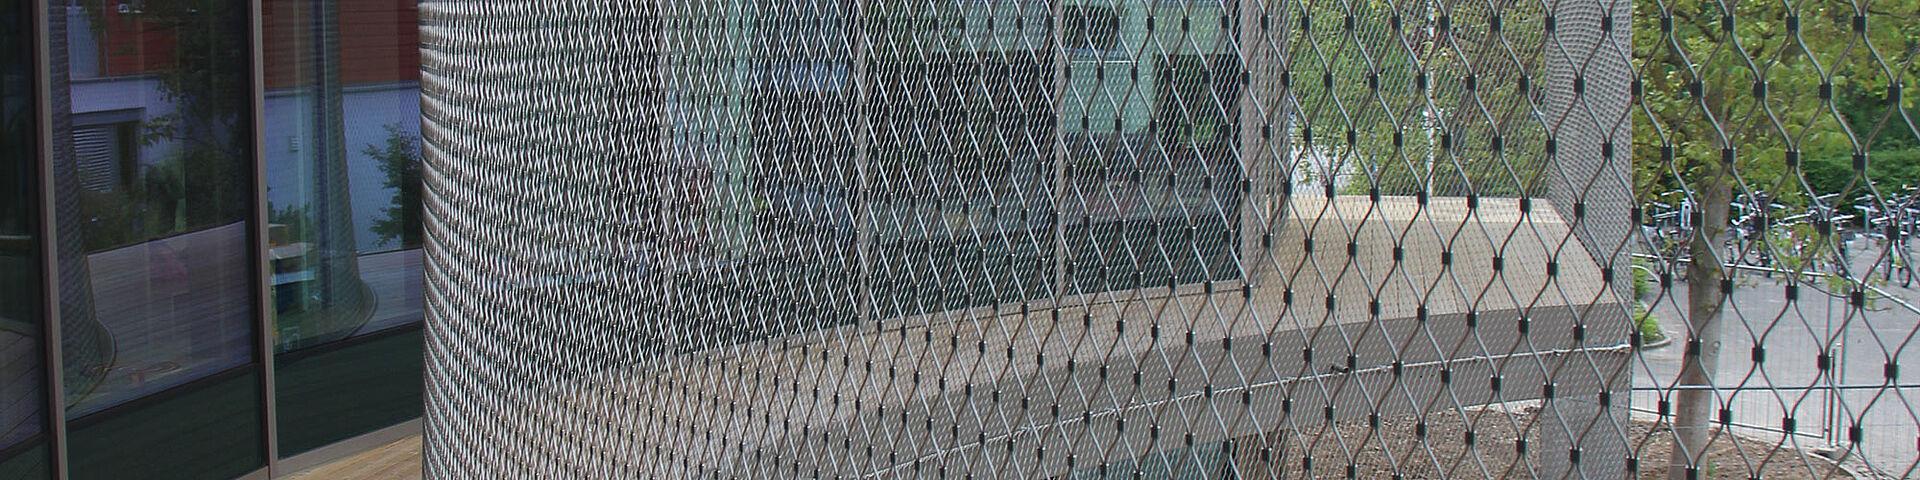 Façade safety satinless steel netting X-TEND